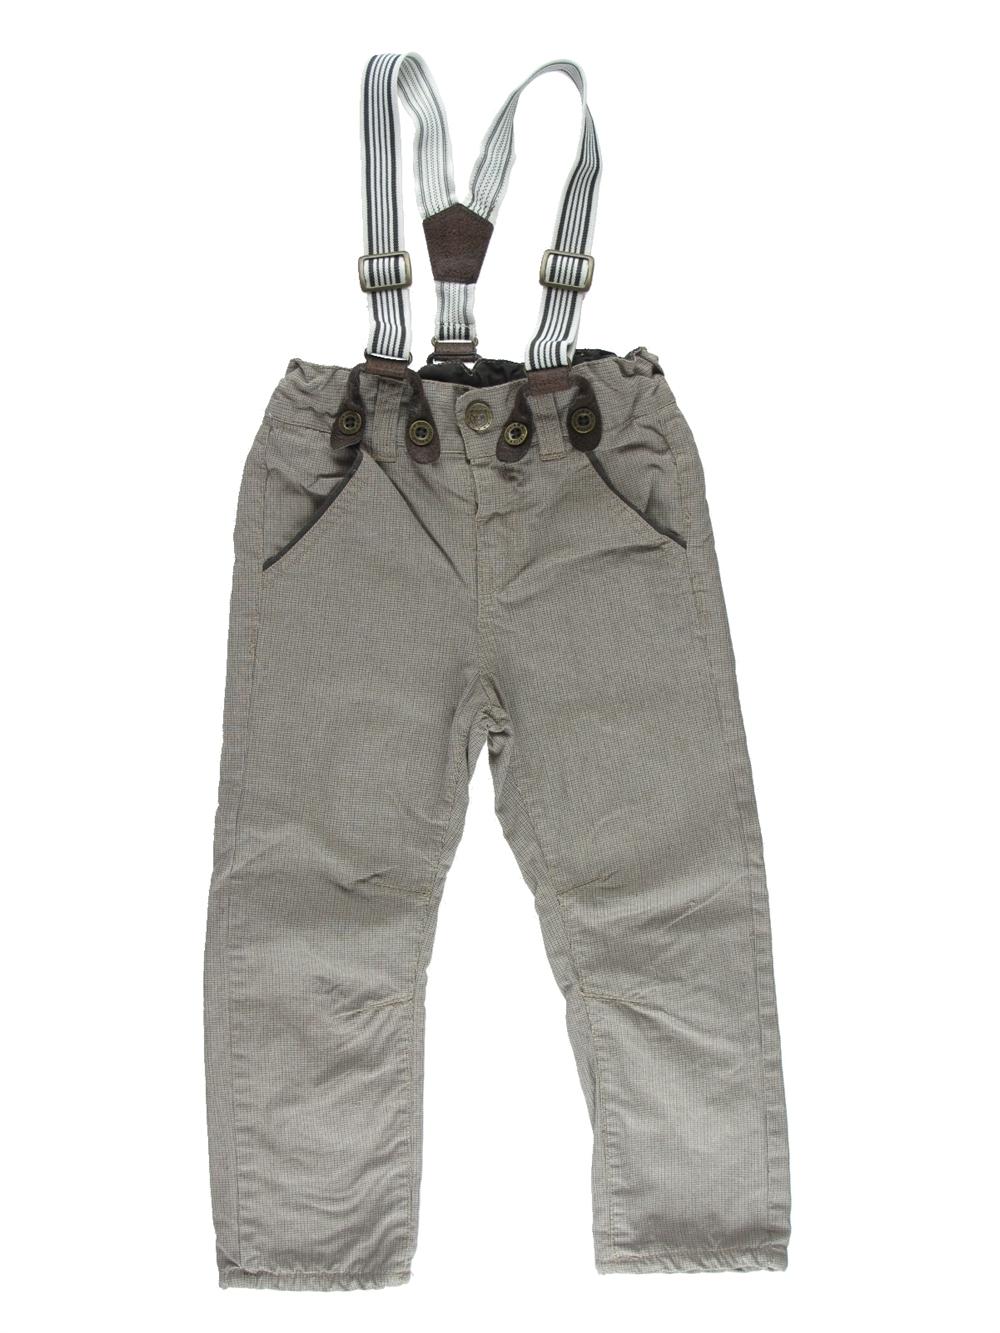 pantalon garcon kiabi 3 ans pas cher. Black Bedroom Furniture Sets. Home Design Ideas